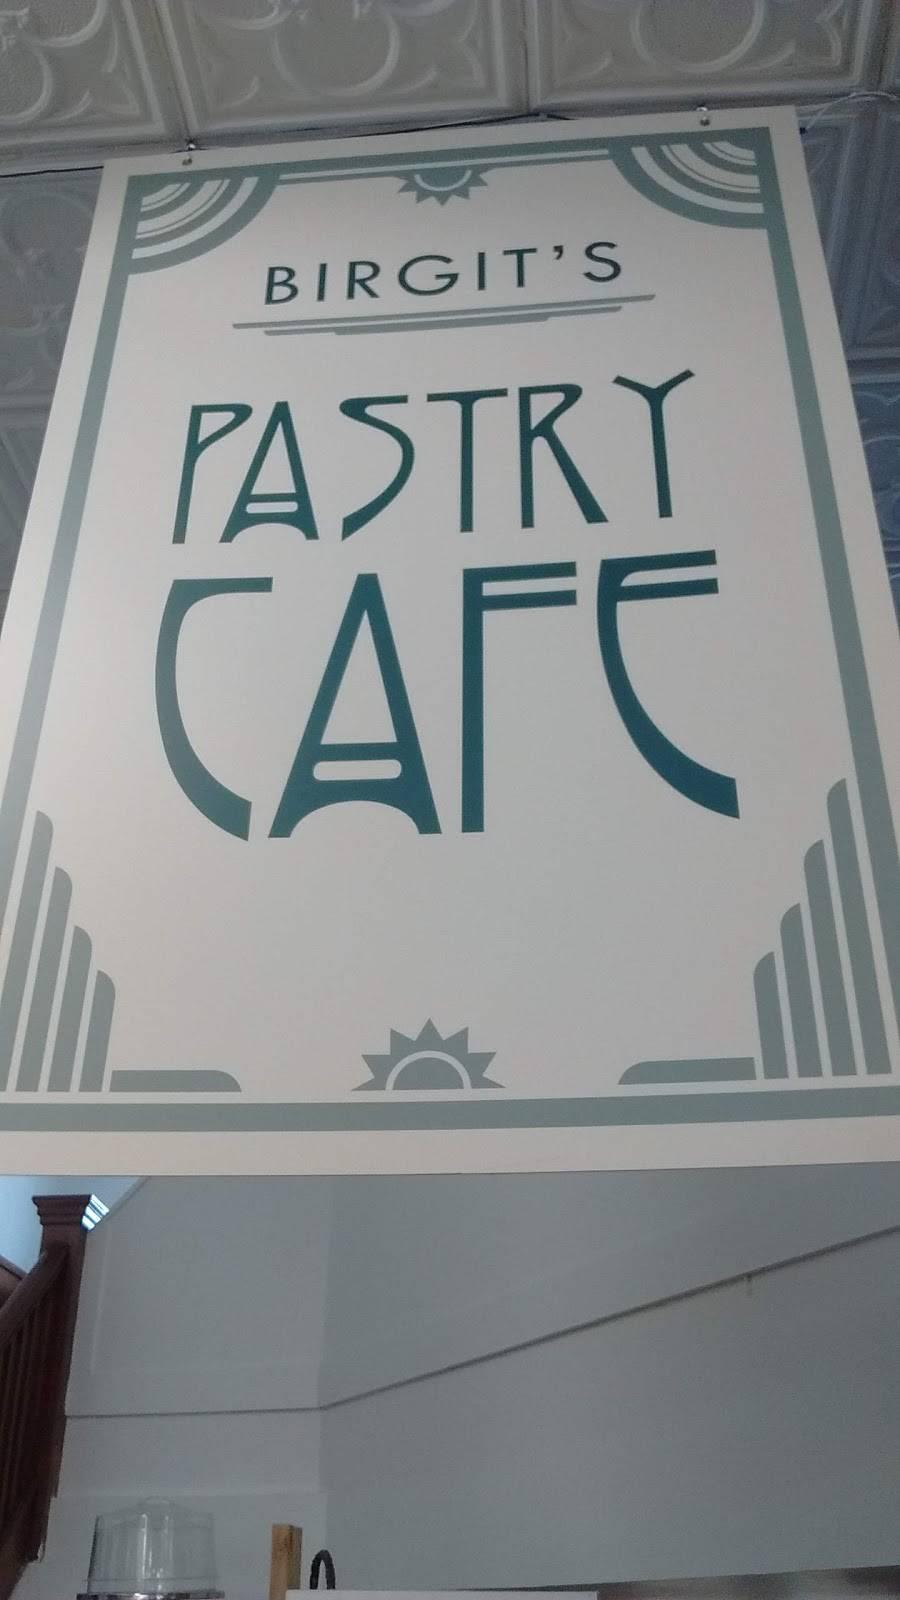 Birgits Pastry Café | bakery | 942 2nd Ave E, Owen Sound, ON N4K 2H6, Canada | 5199862918 OR +1 519-986-2918